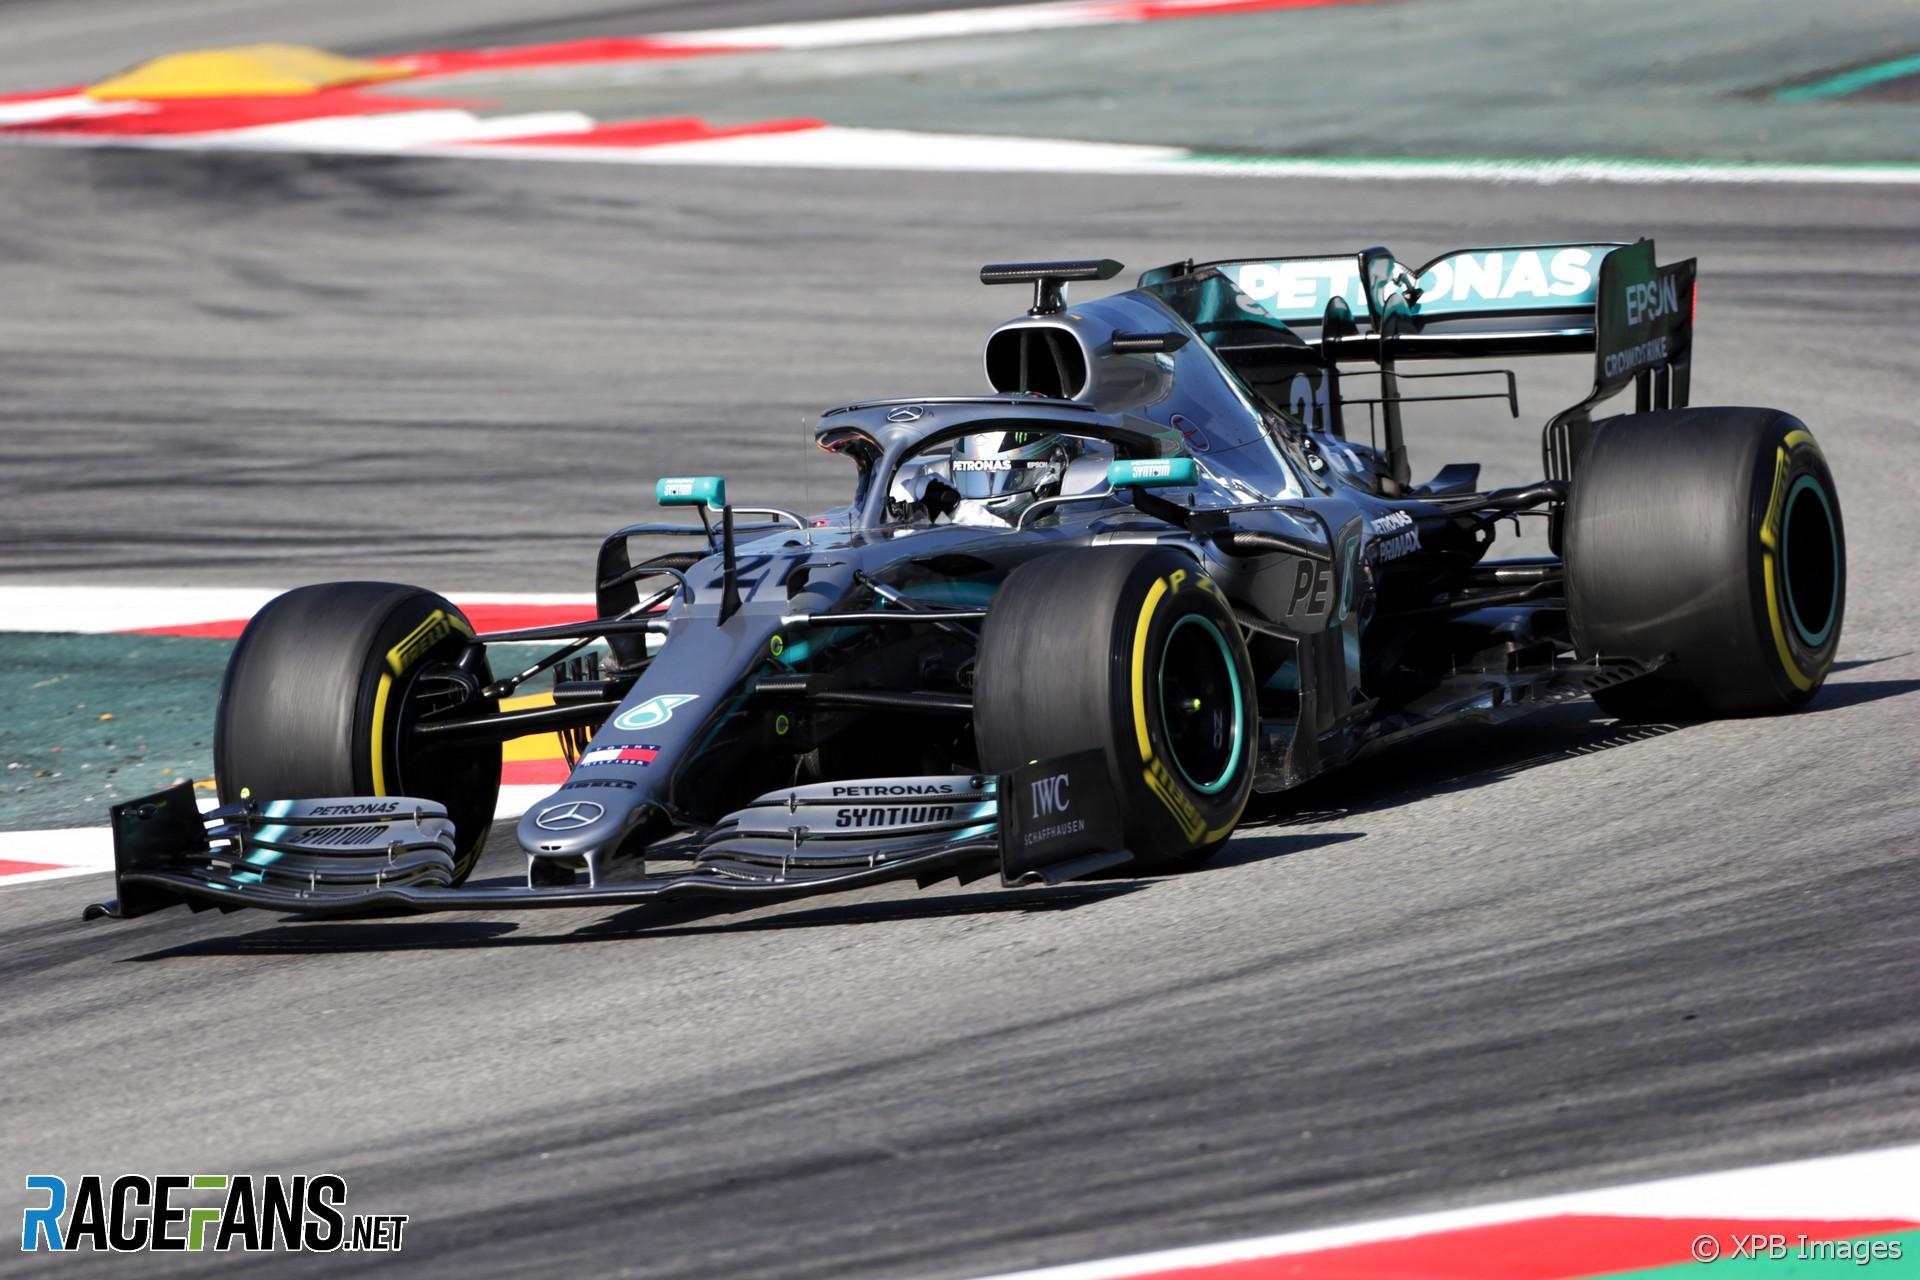 Nikita Mazepin, Mercedes, Circuit de Catalunya